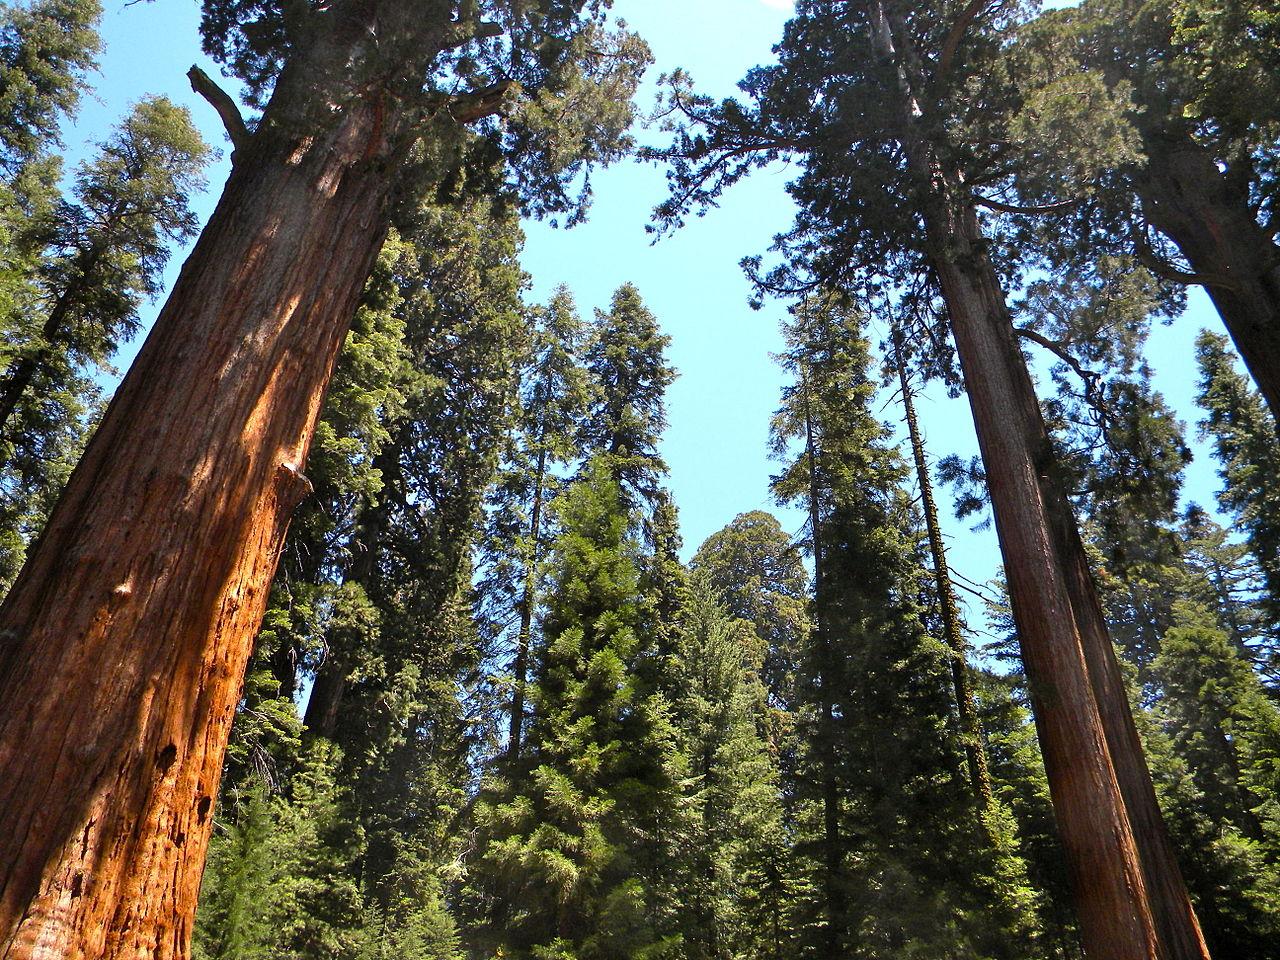 Giantsequoias.JPG